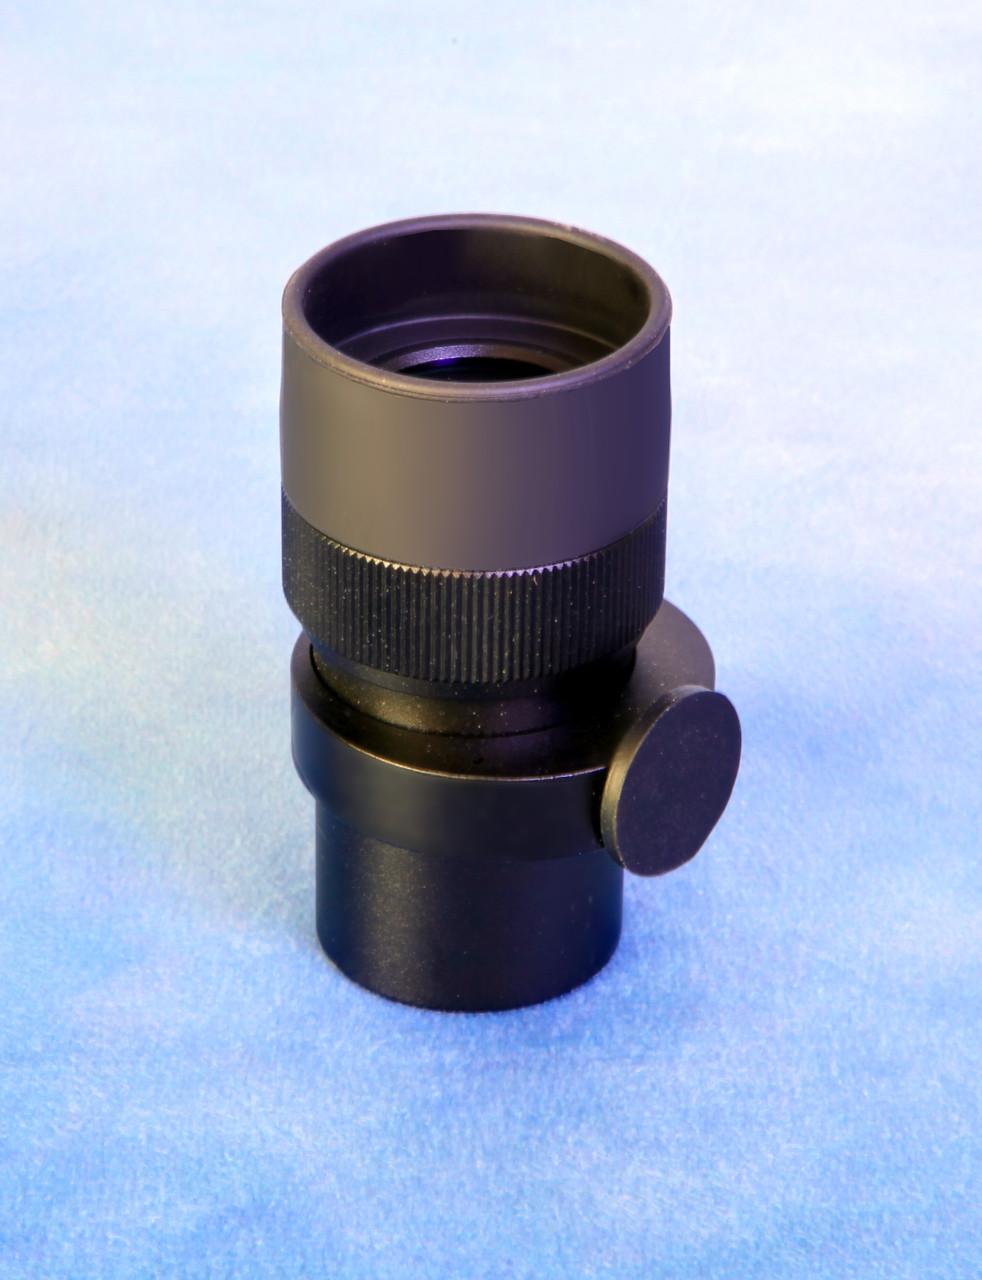 E3023R Finder Scope Eyepiece